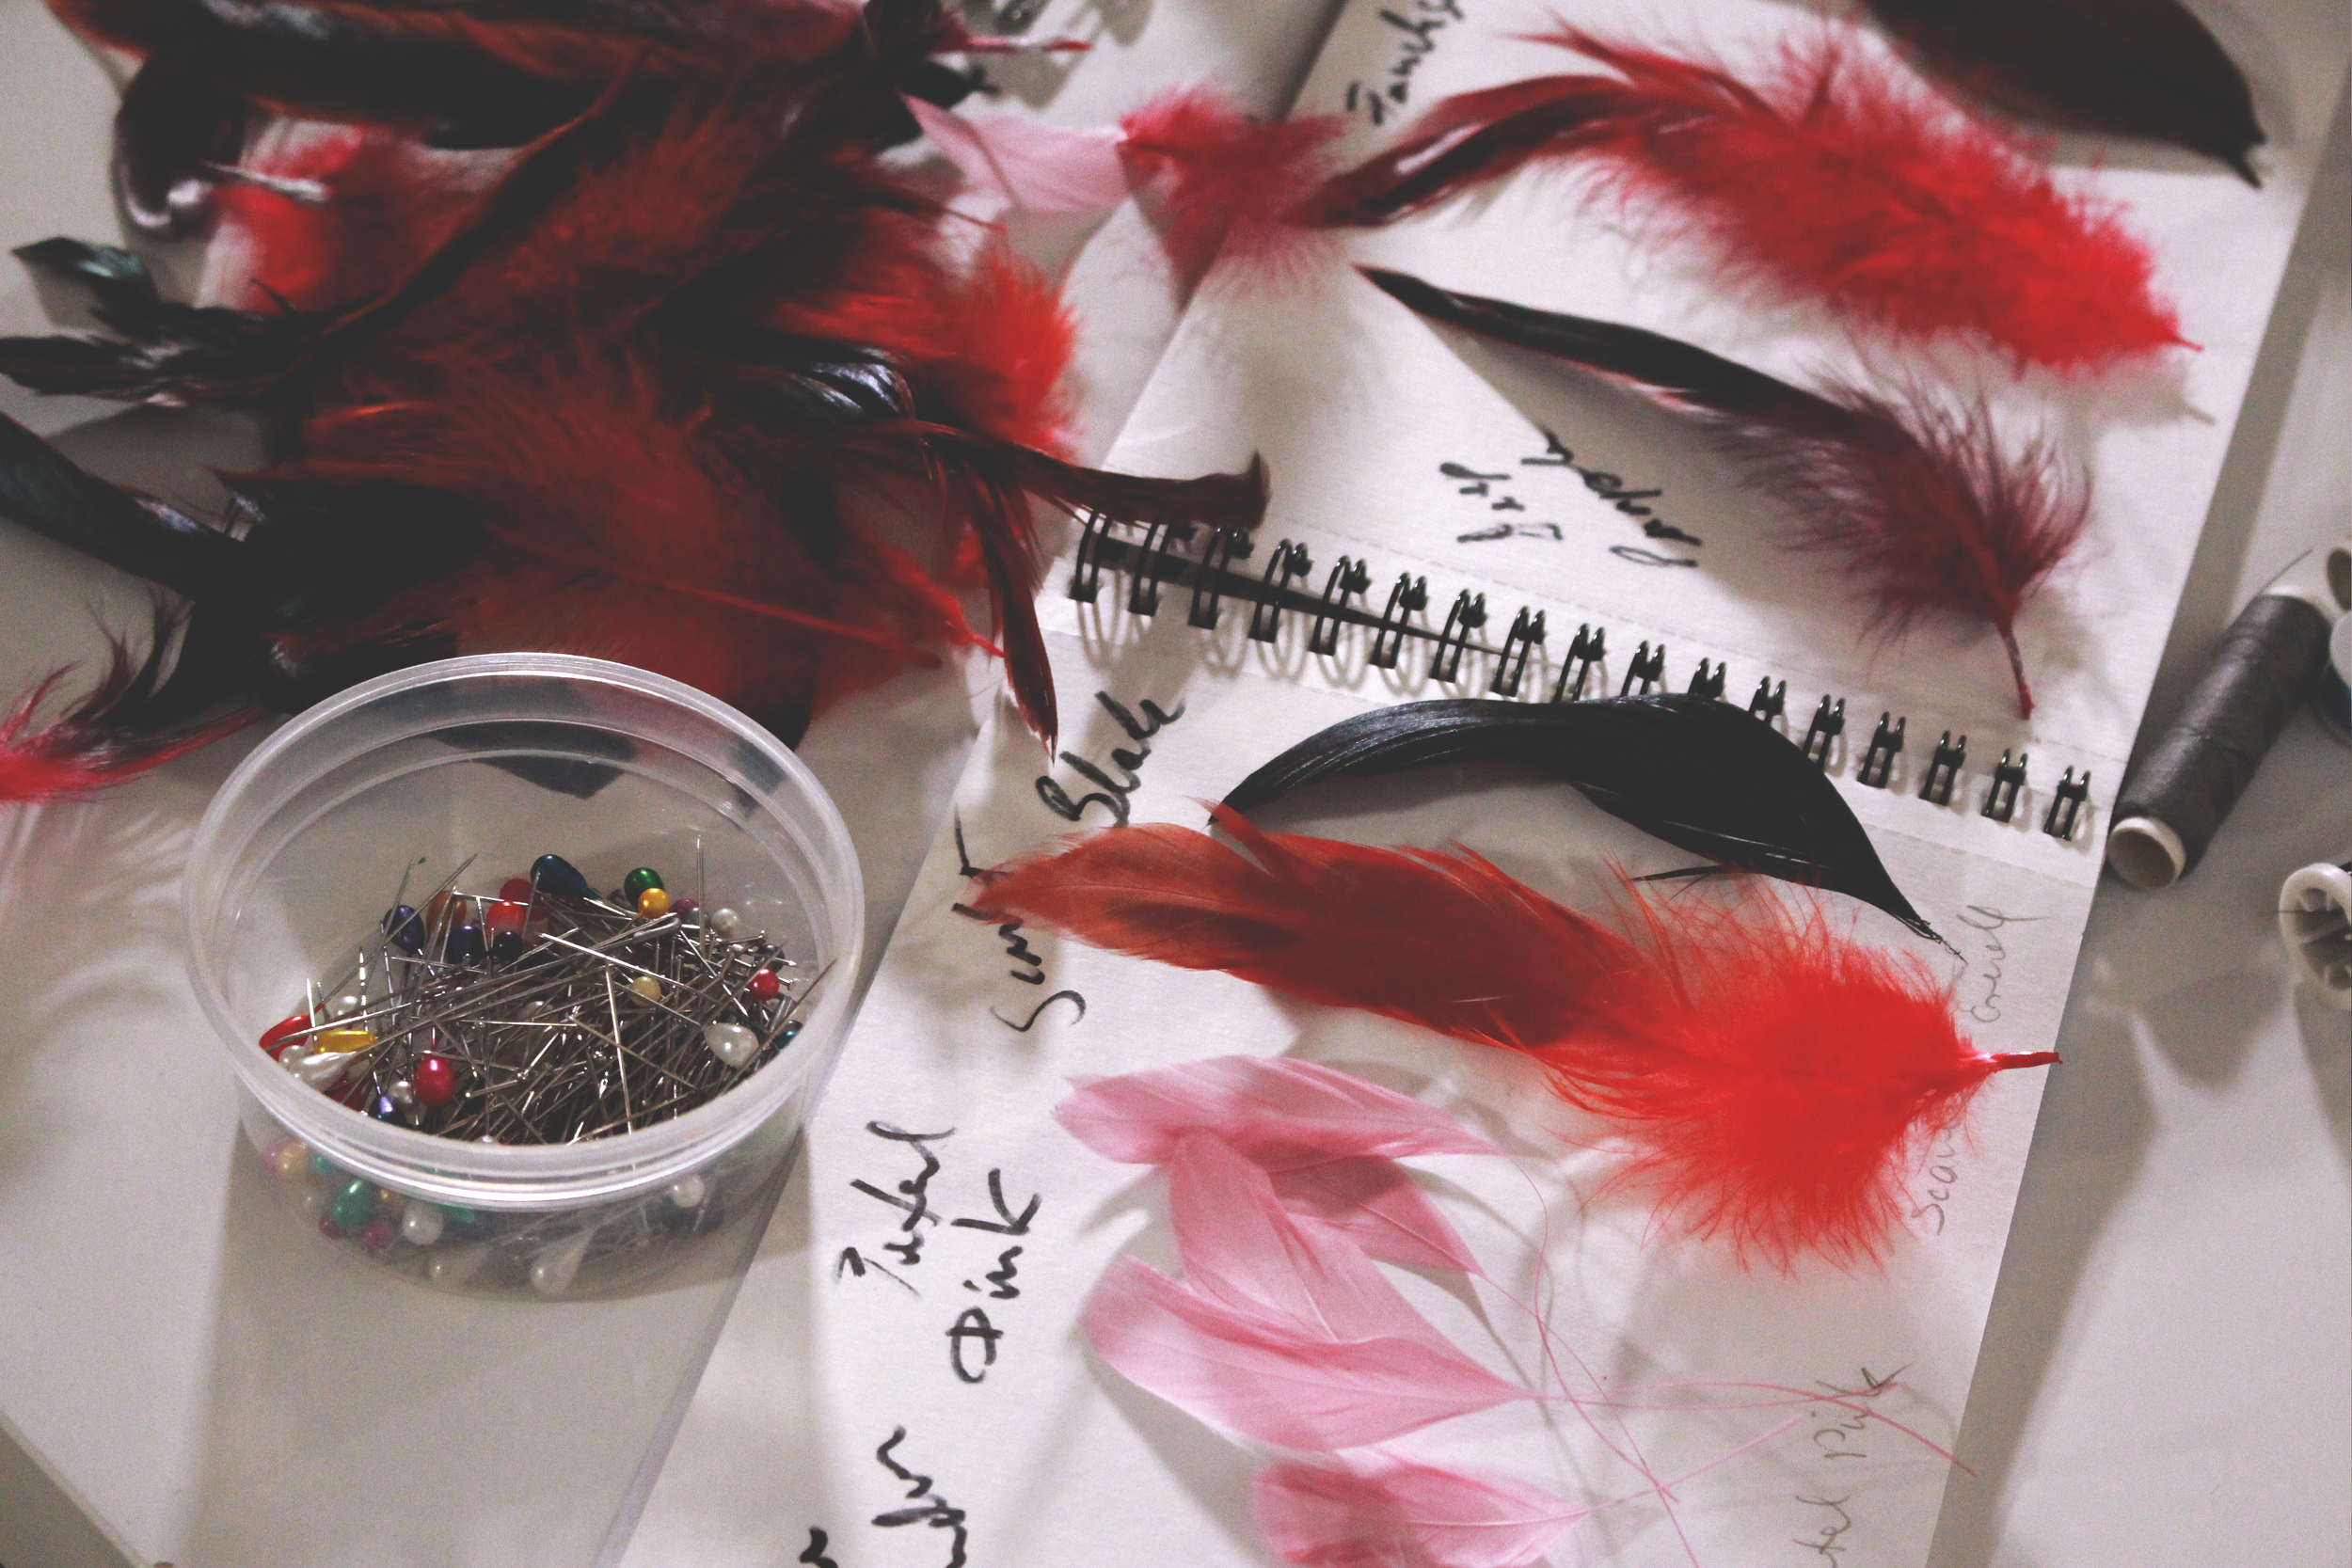 Diana Rogo Feather Manifesto 6.jpg